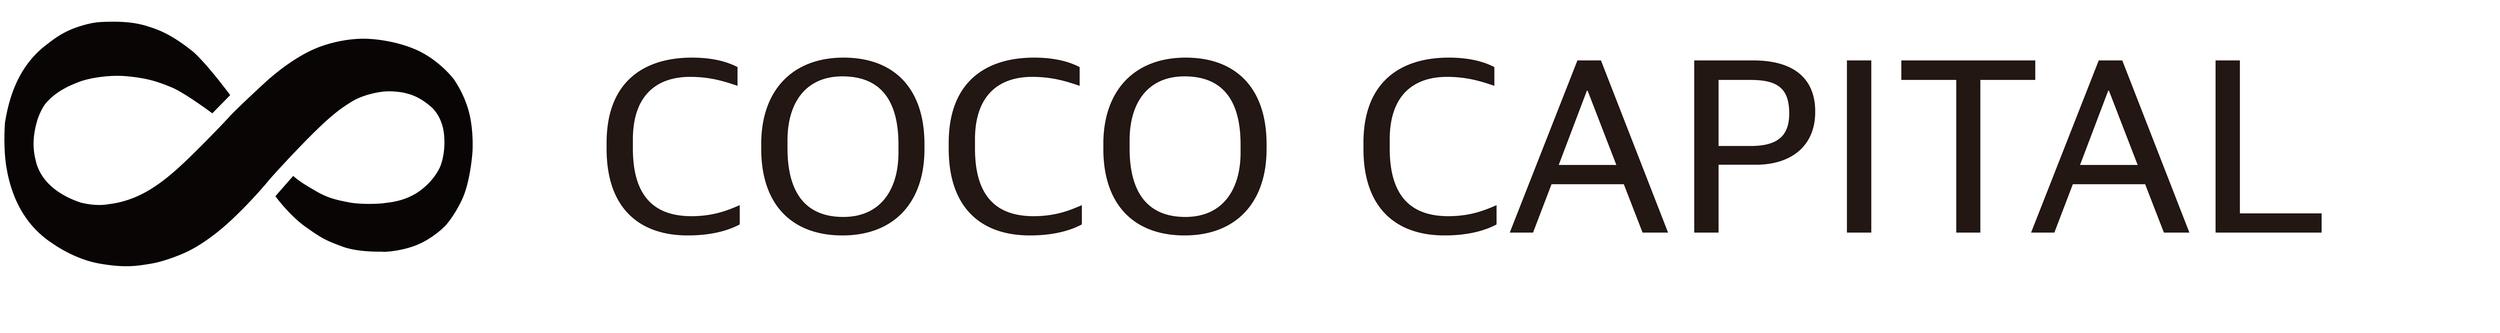 COCO CAPITAL LOGO.jpg